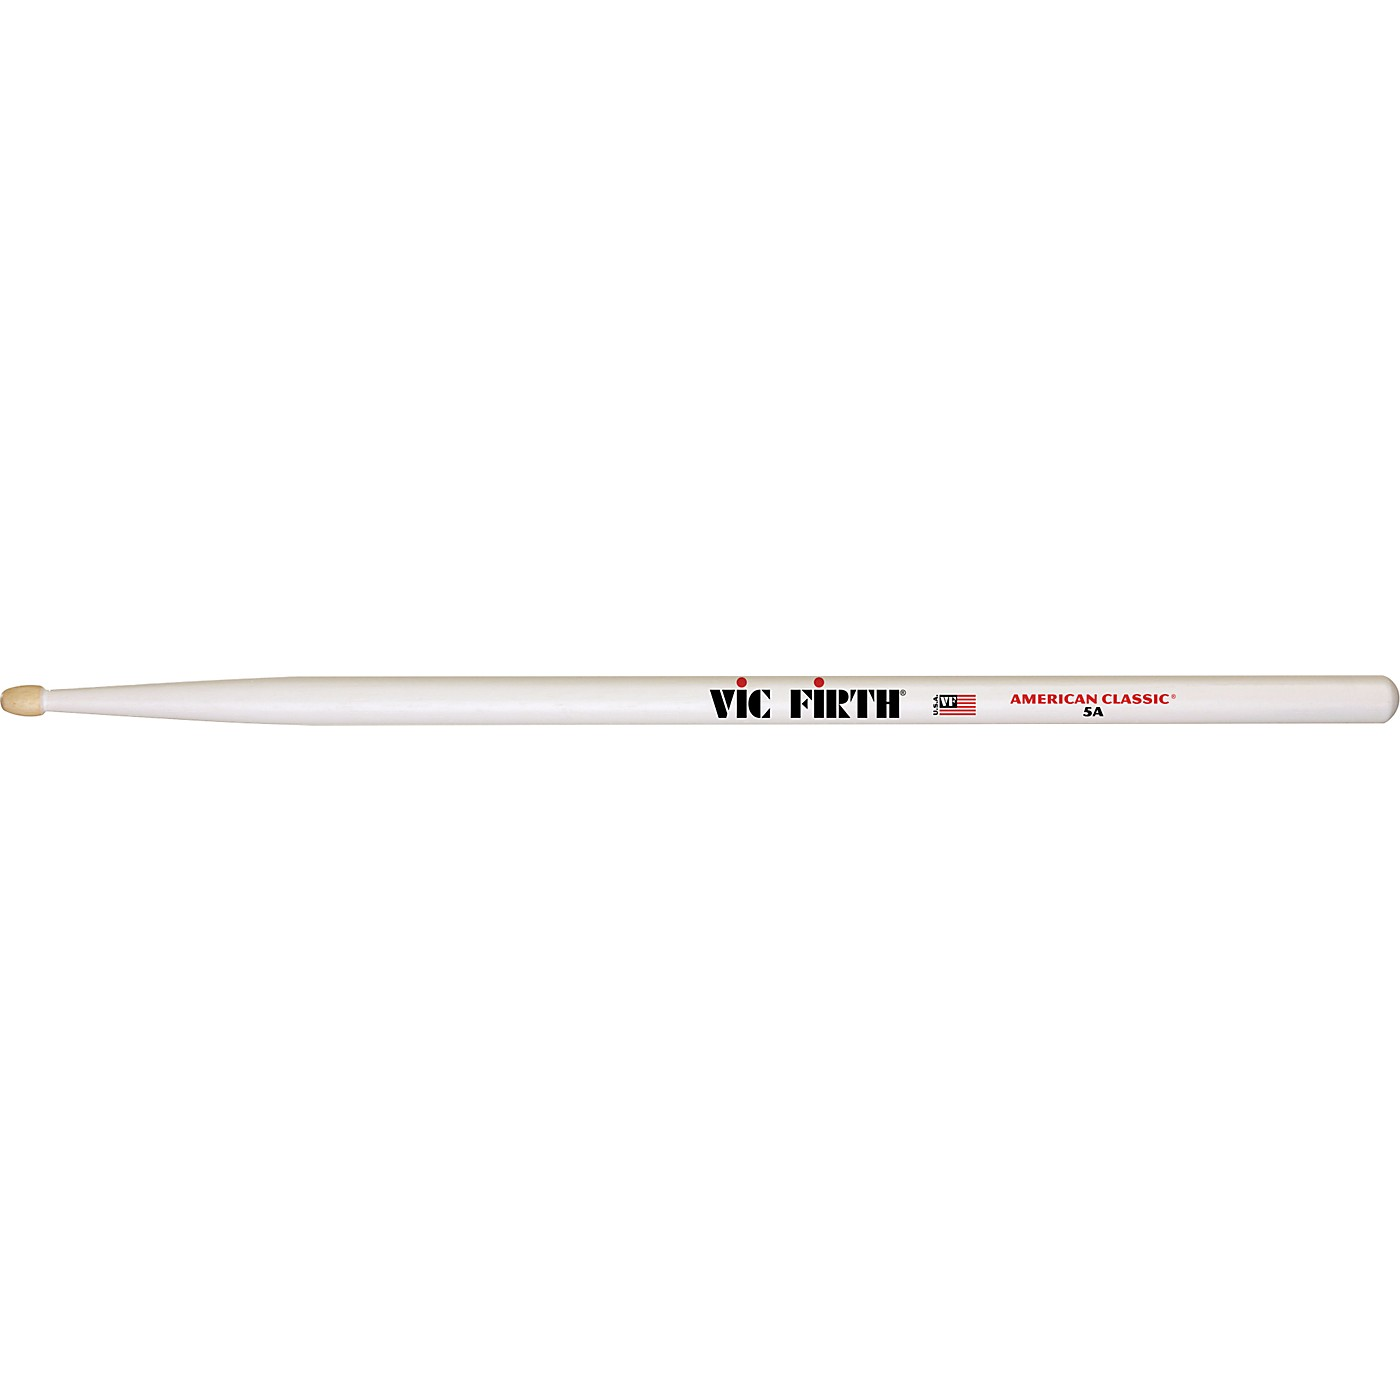 Vic Firth American Classic Drum Sticks thumbnail